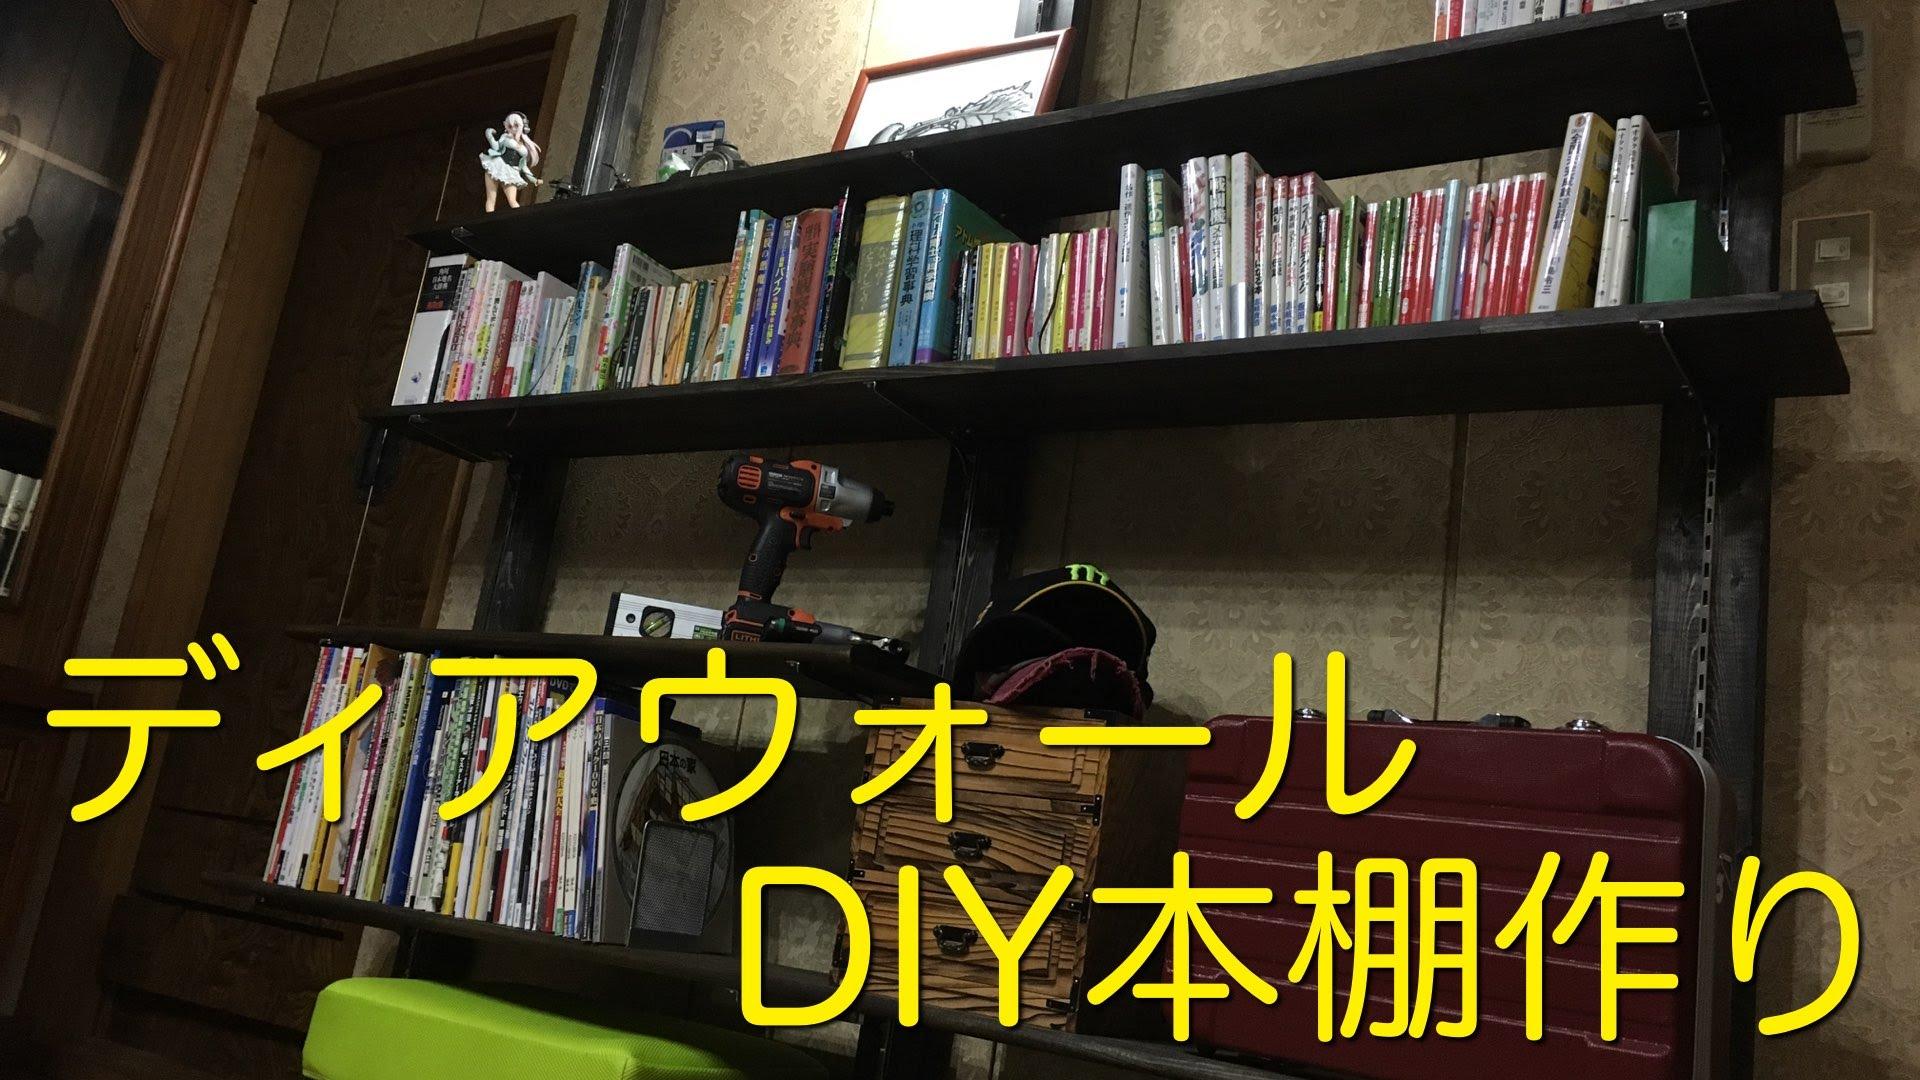 【DIY】ディアウォールで自作本棚作り【日曜大工】